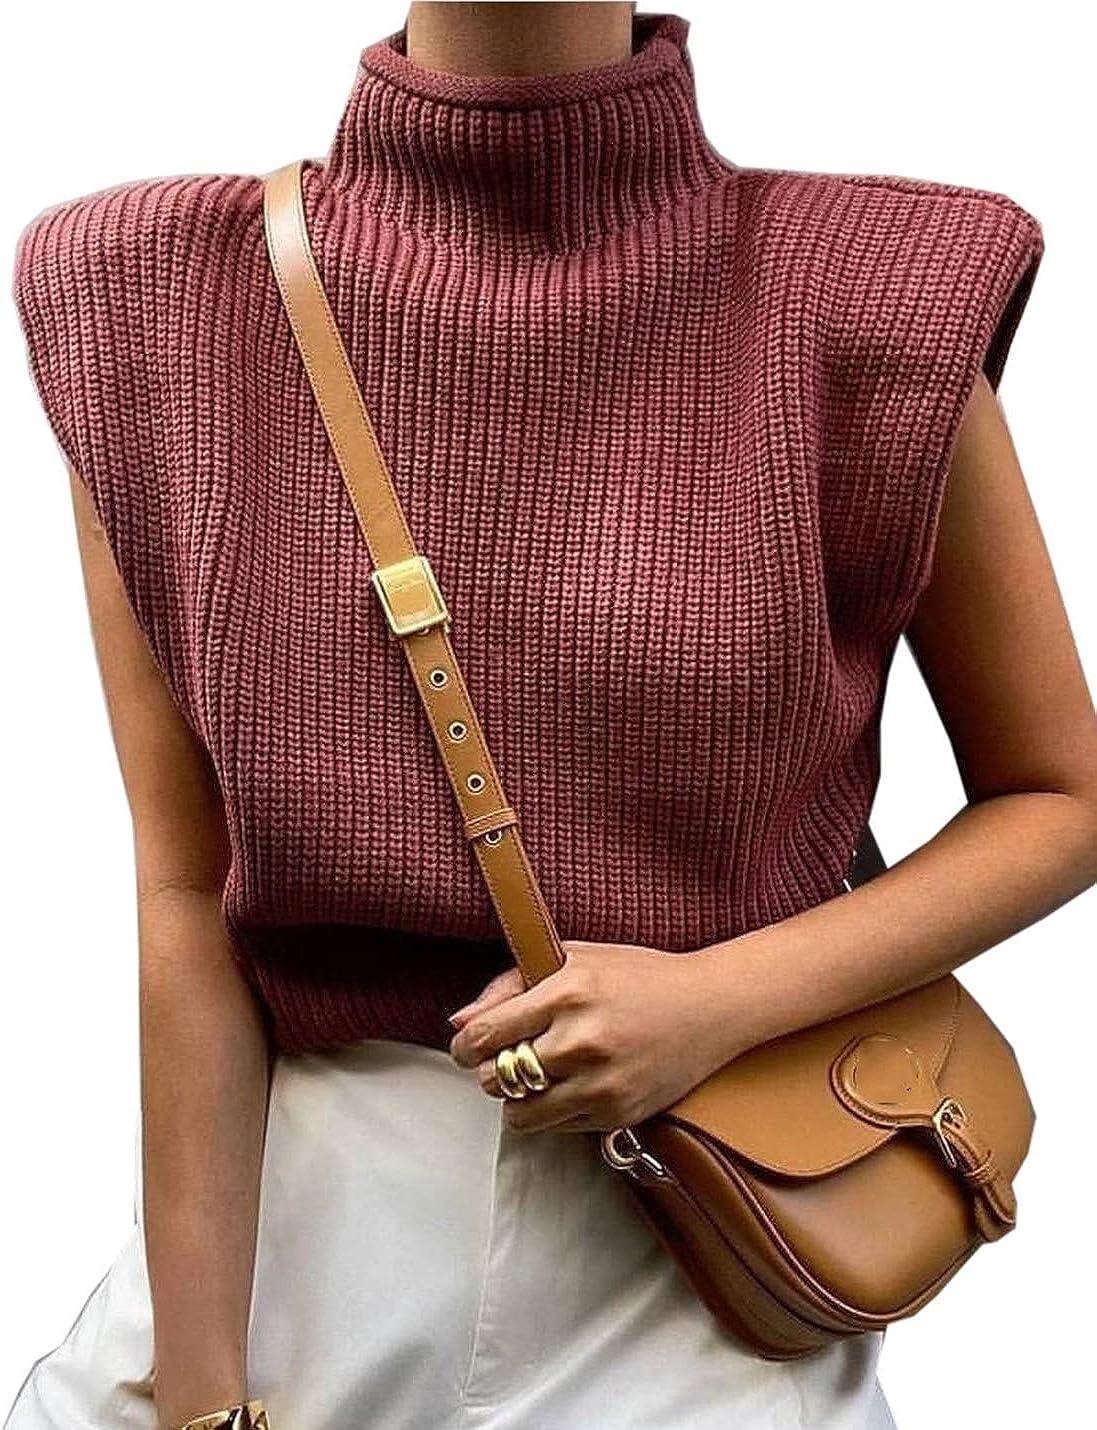 PAODIKUAI Women Sexy Turtleneck Sleeveless Knitted Sweater Vest Streetwear